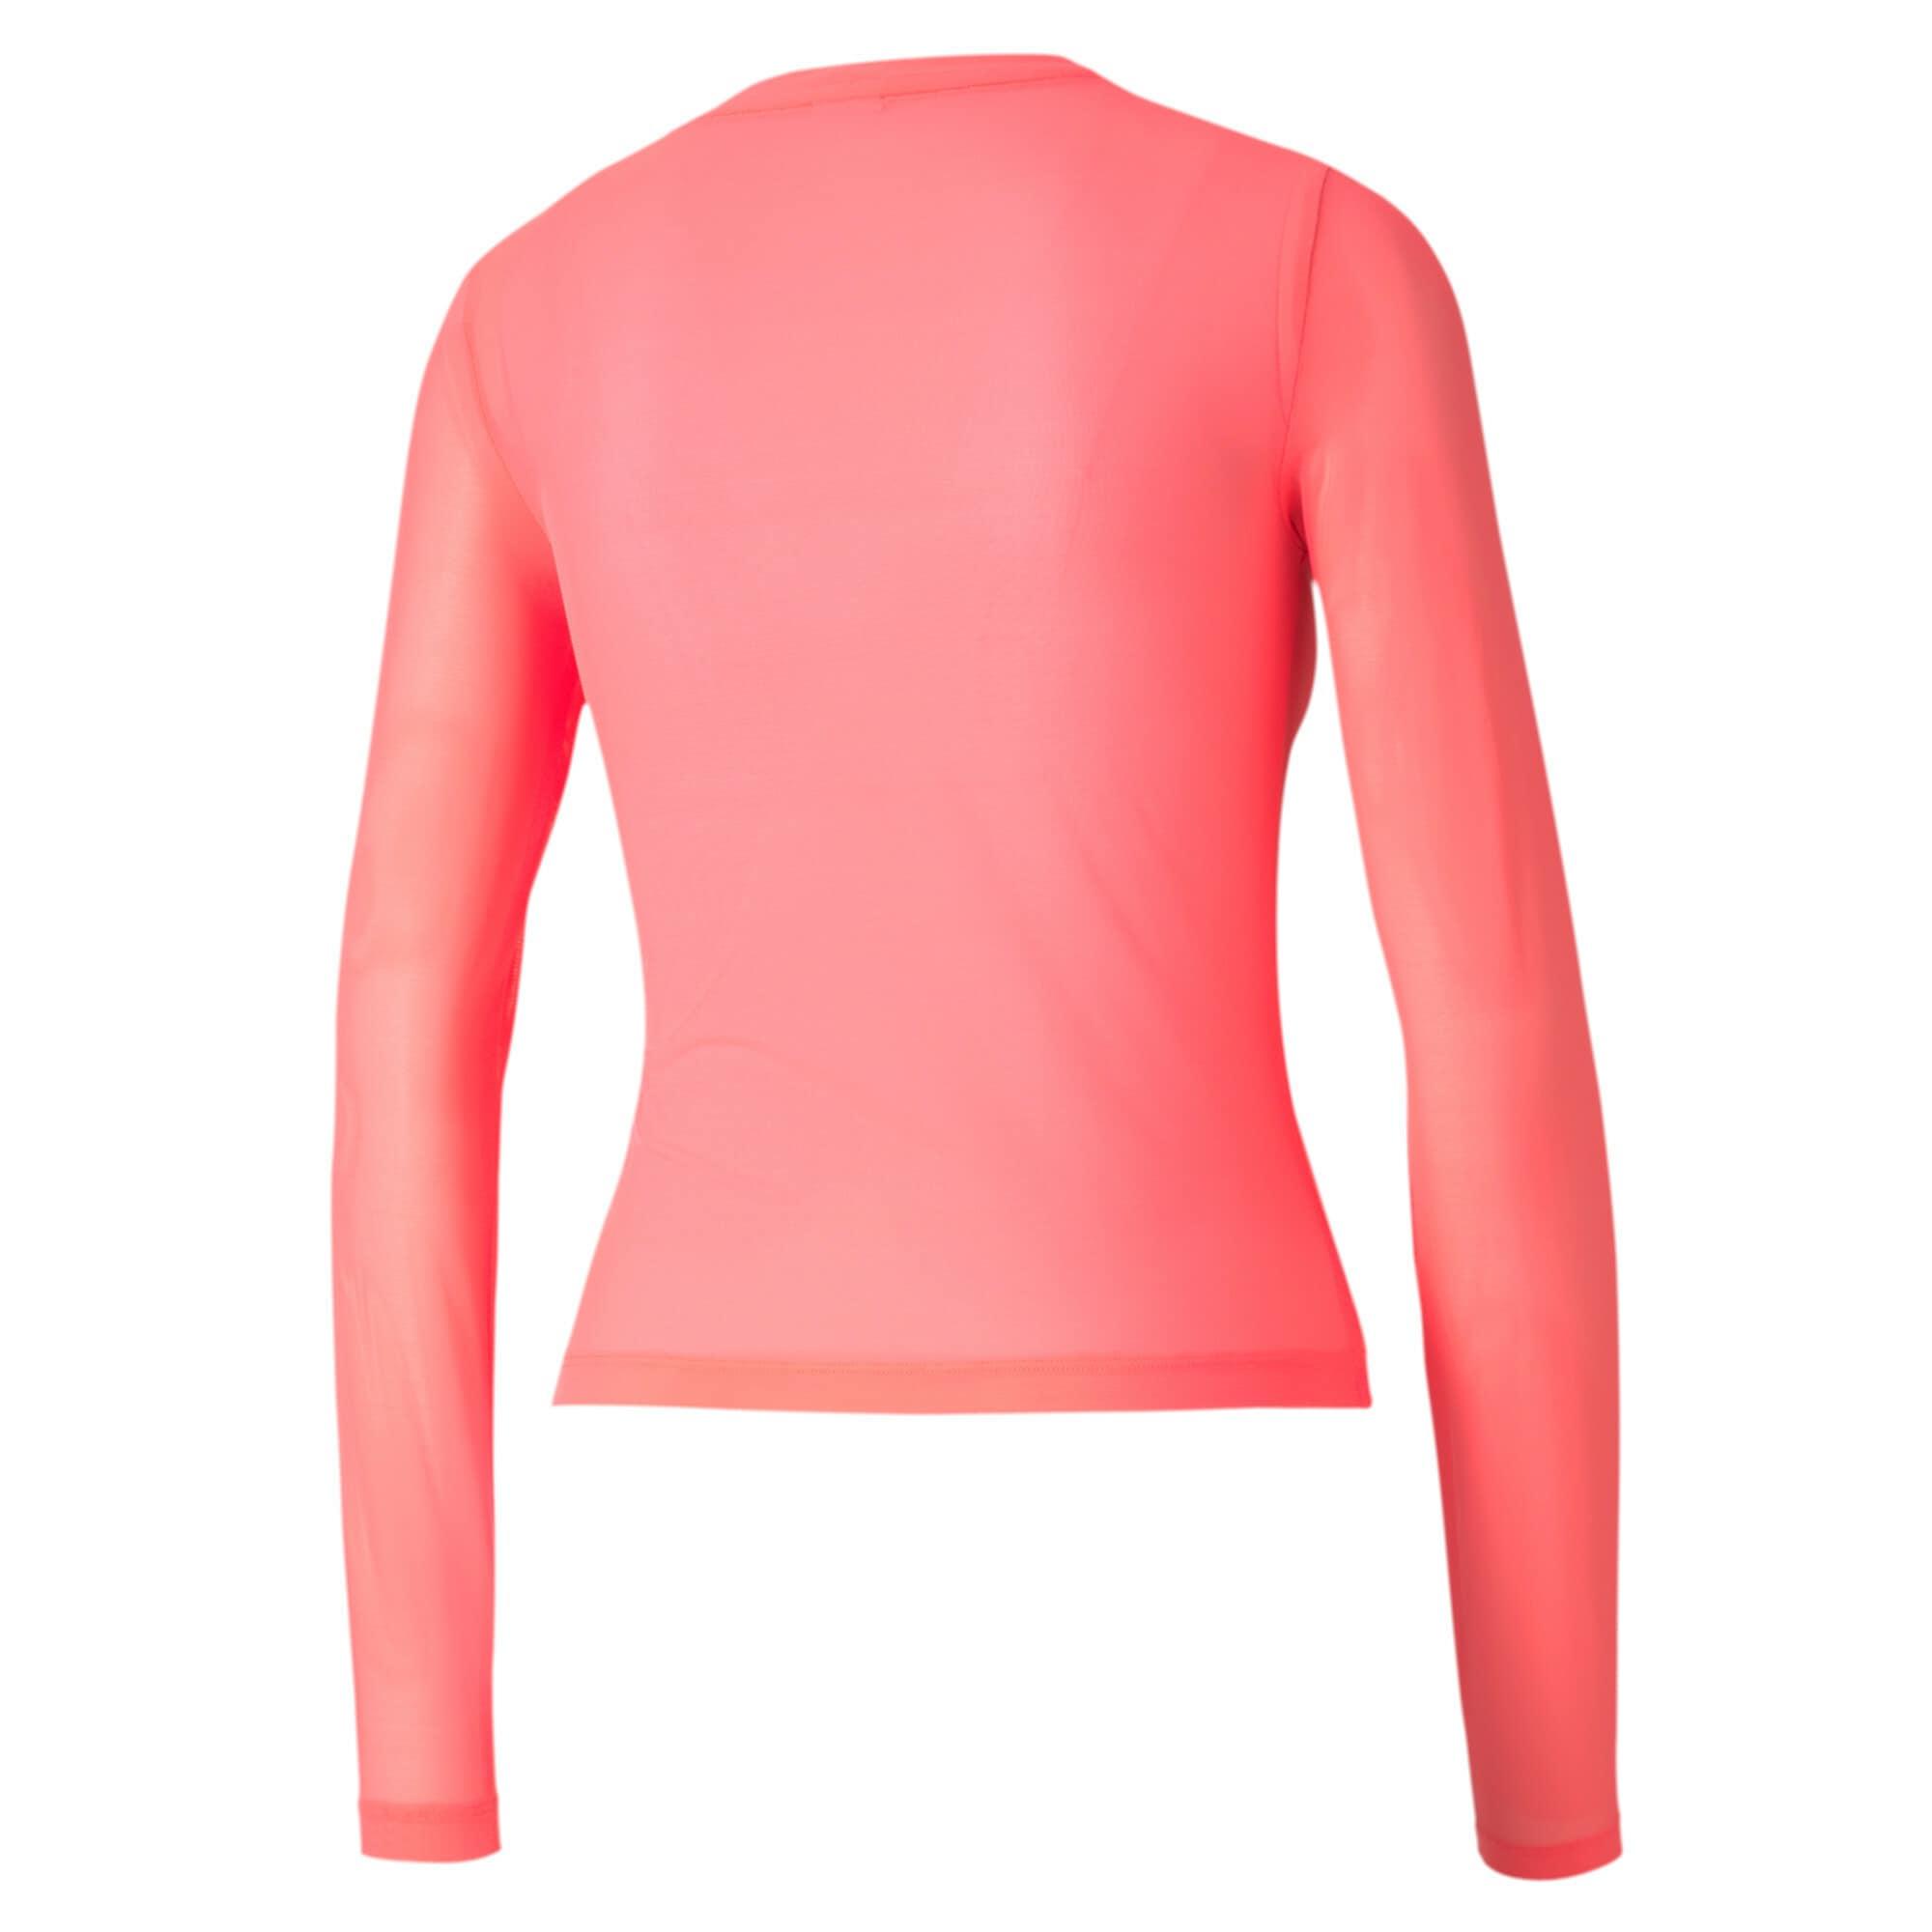 puma - Evide Damen Mesh Langarm-Shirt